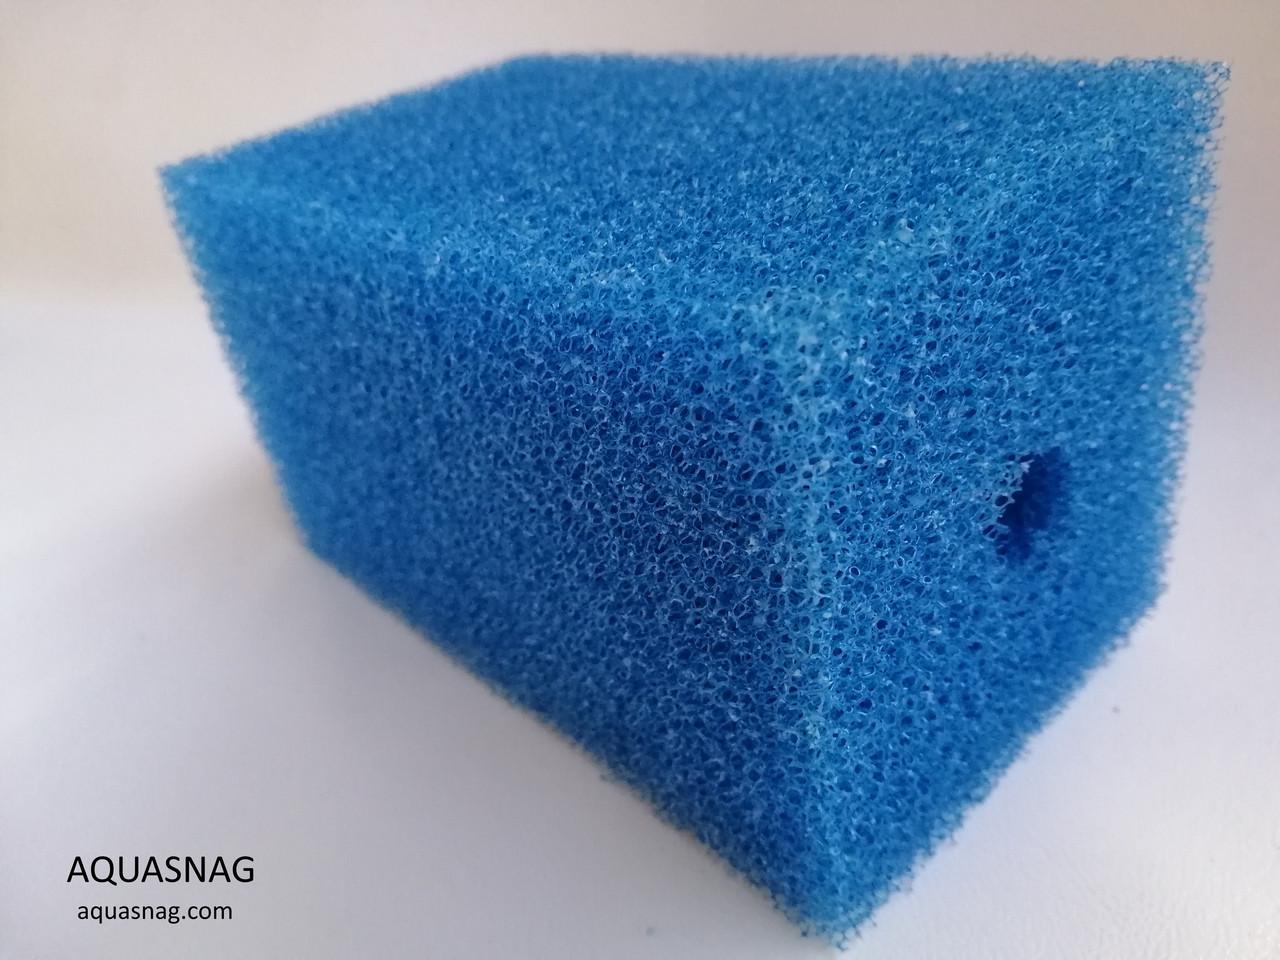 Мочалка синяя (6*6*10)см, среднепористая